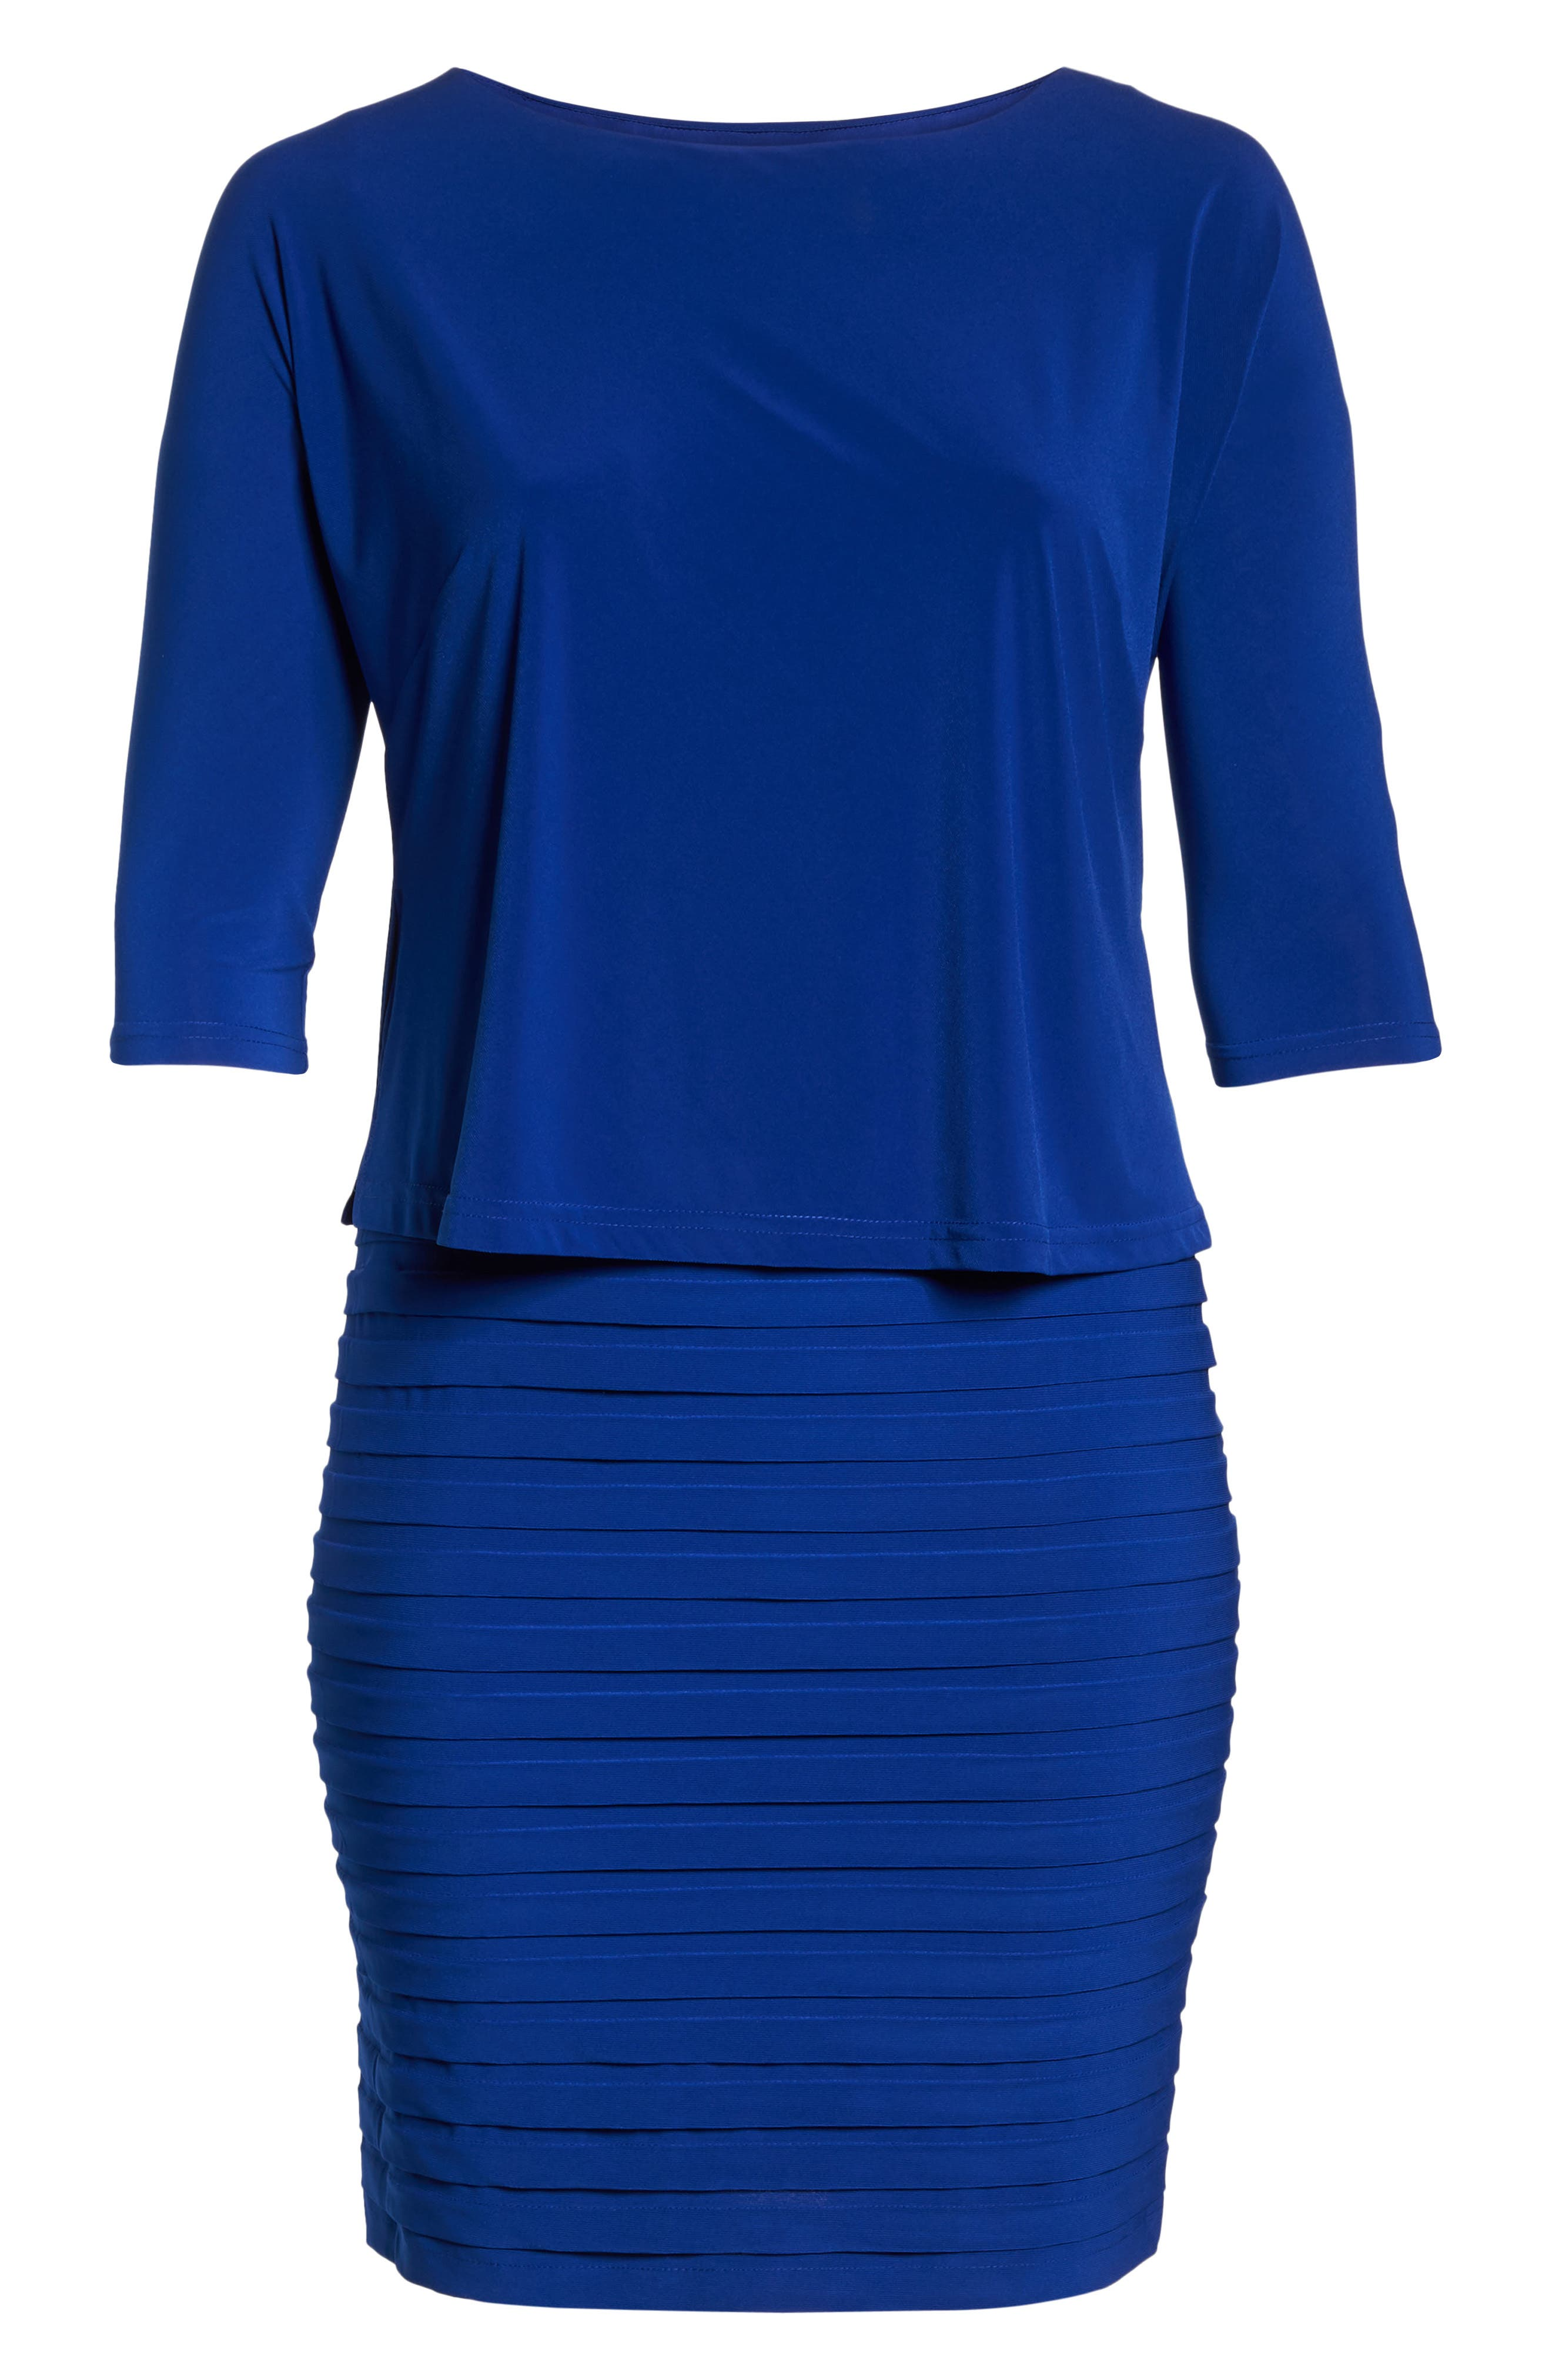 Shutter Pleat Popover Sheath Dress,                             Alternate thumbnail 8, color,                             SAPPHIRE